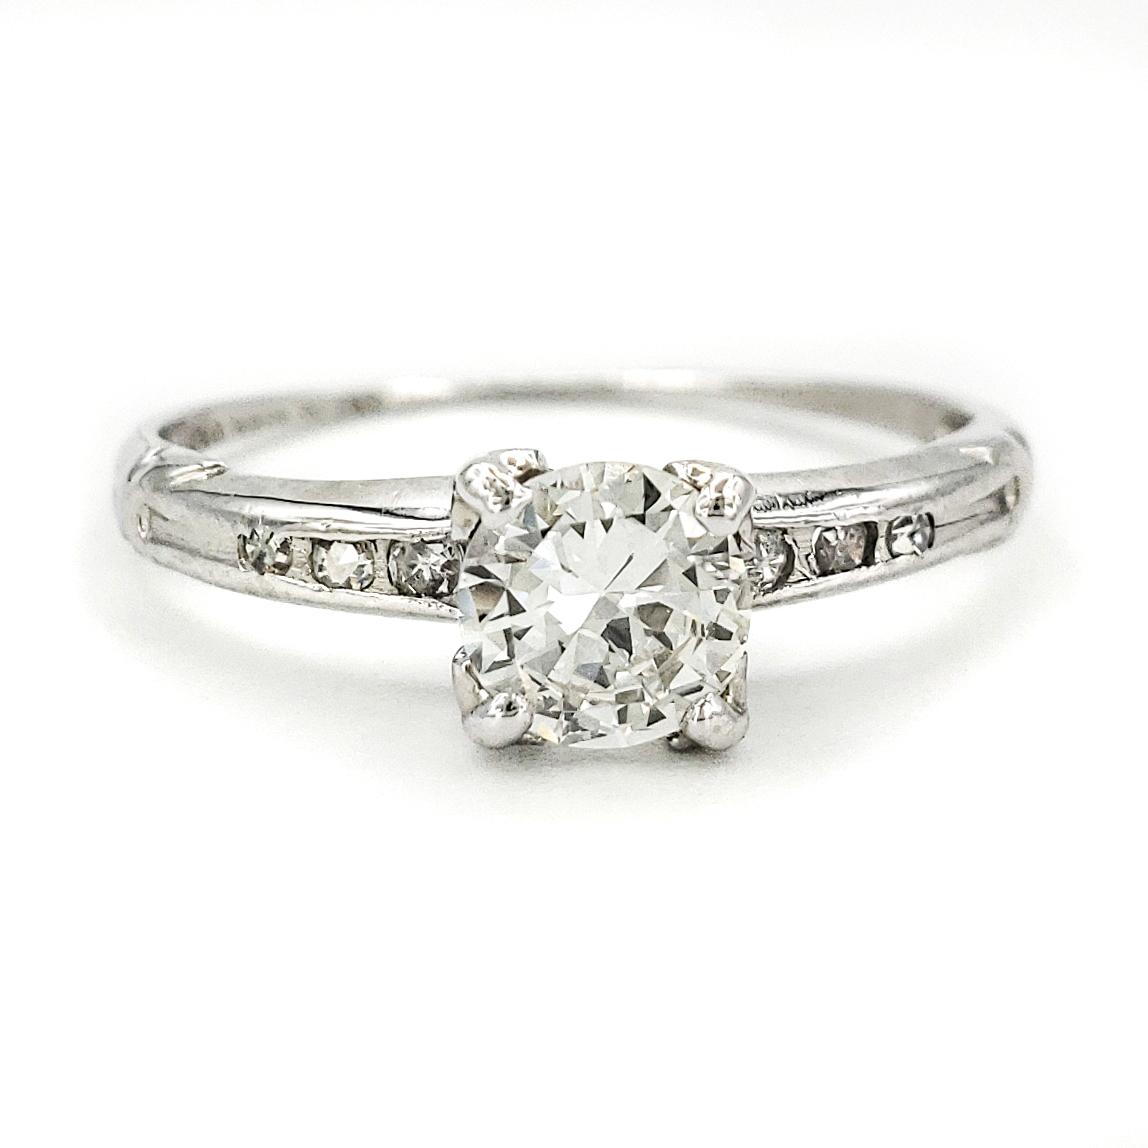 vintage-platinum-engagement-ring-with-0-45-carat-transitional-brilliant-cut-diamond-egl-h-vs1